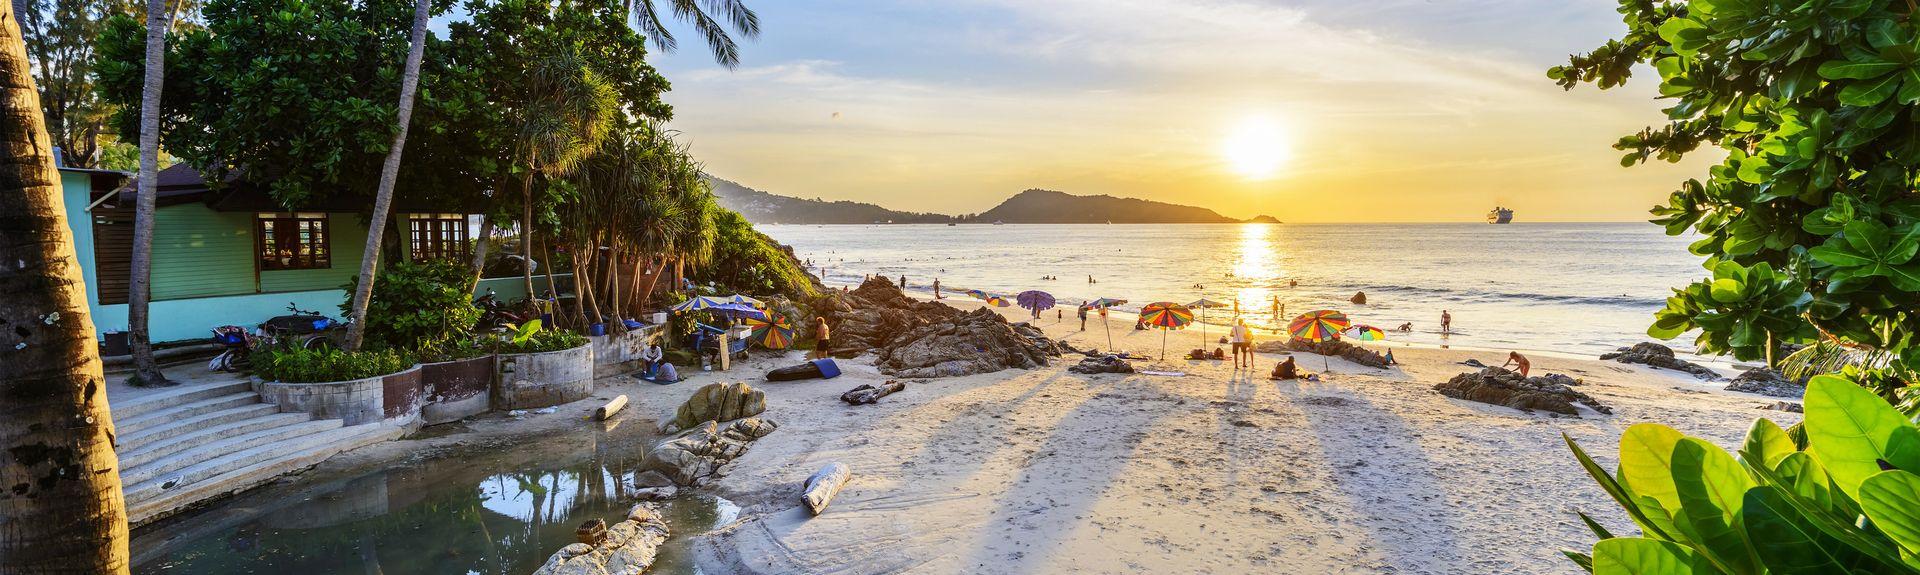 Plage de Patong, Patong, Province de Phuket, Thaïlande